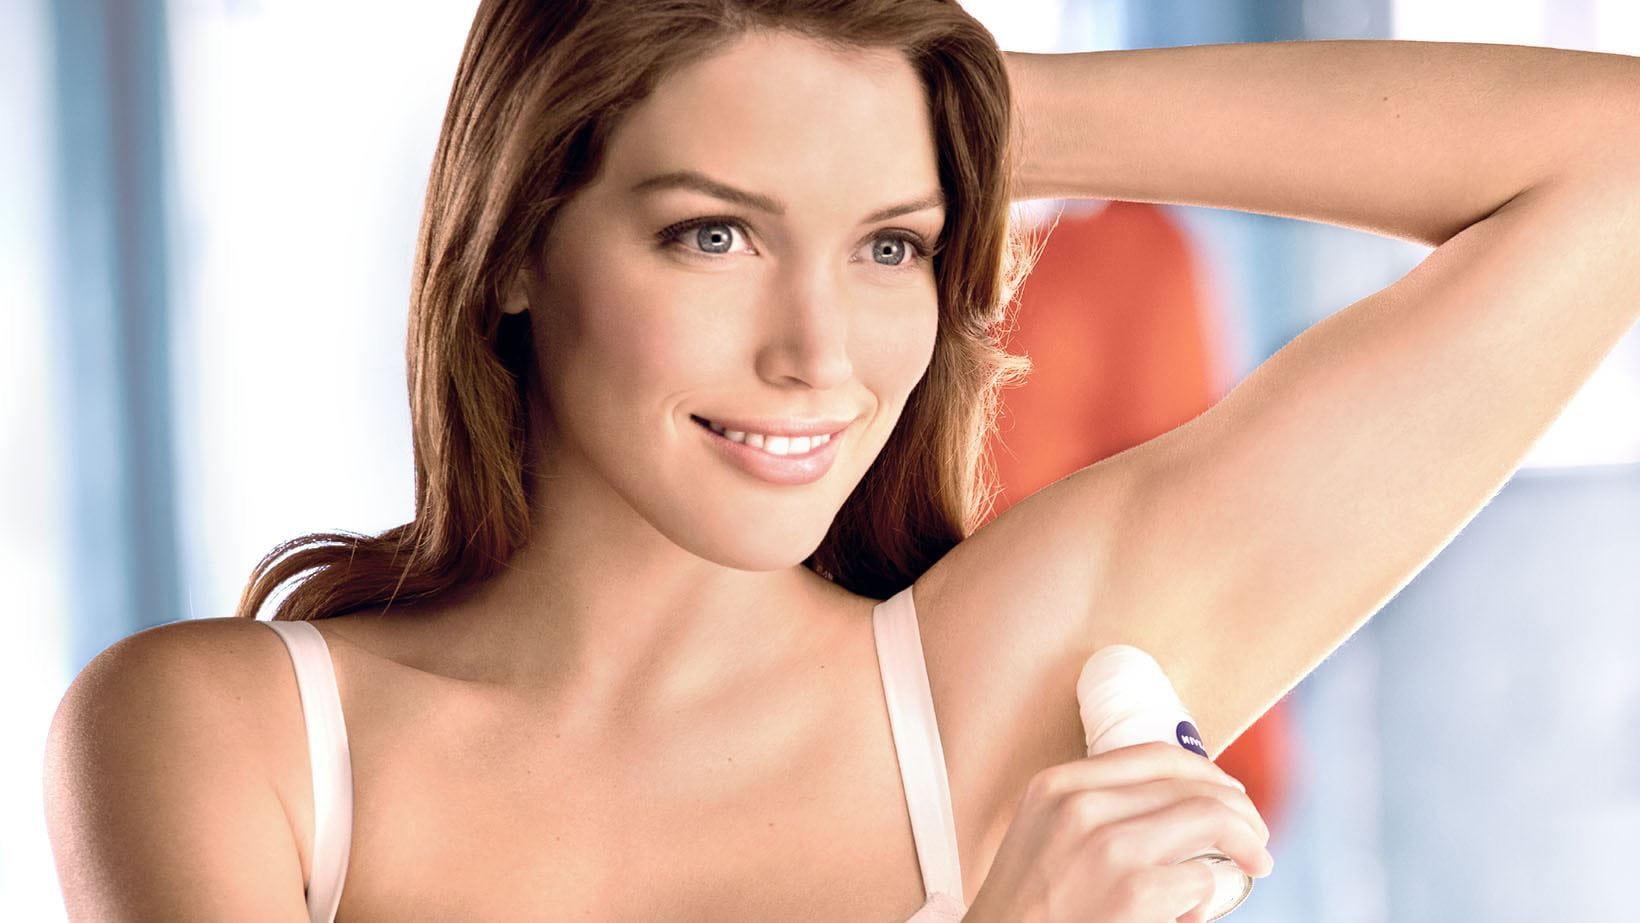 Woman using pH-Balancing Deodorant